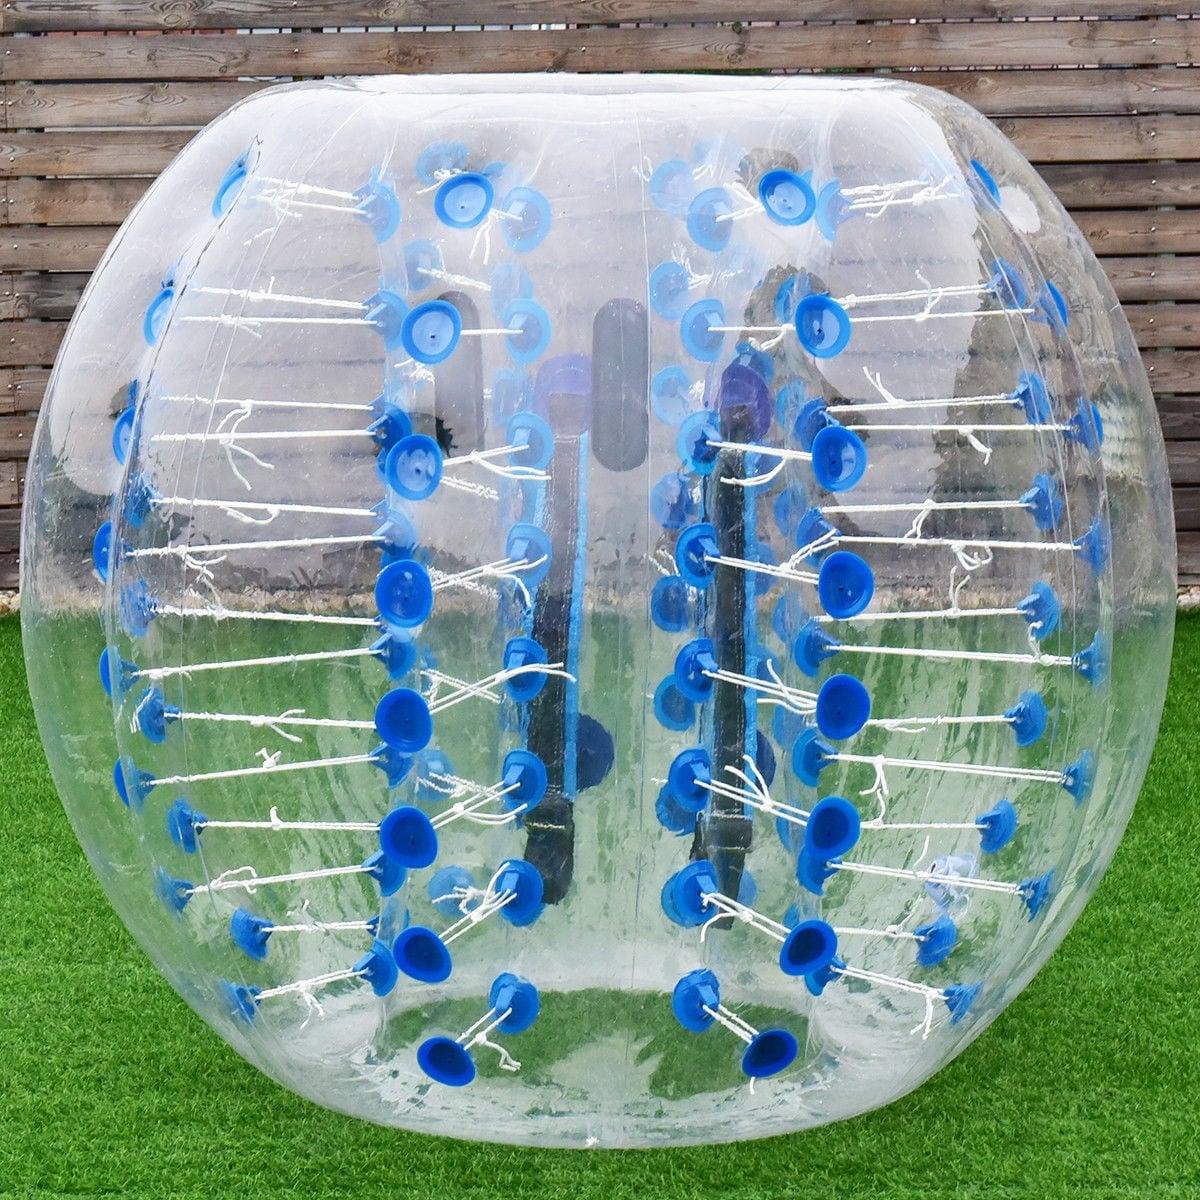 1.5M Inflatable Bumper Ball Dia 5/' Bubble Body PVC Soccer Ball Human Knocker